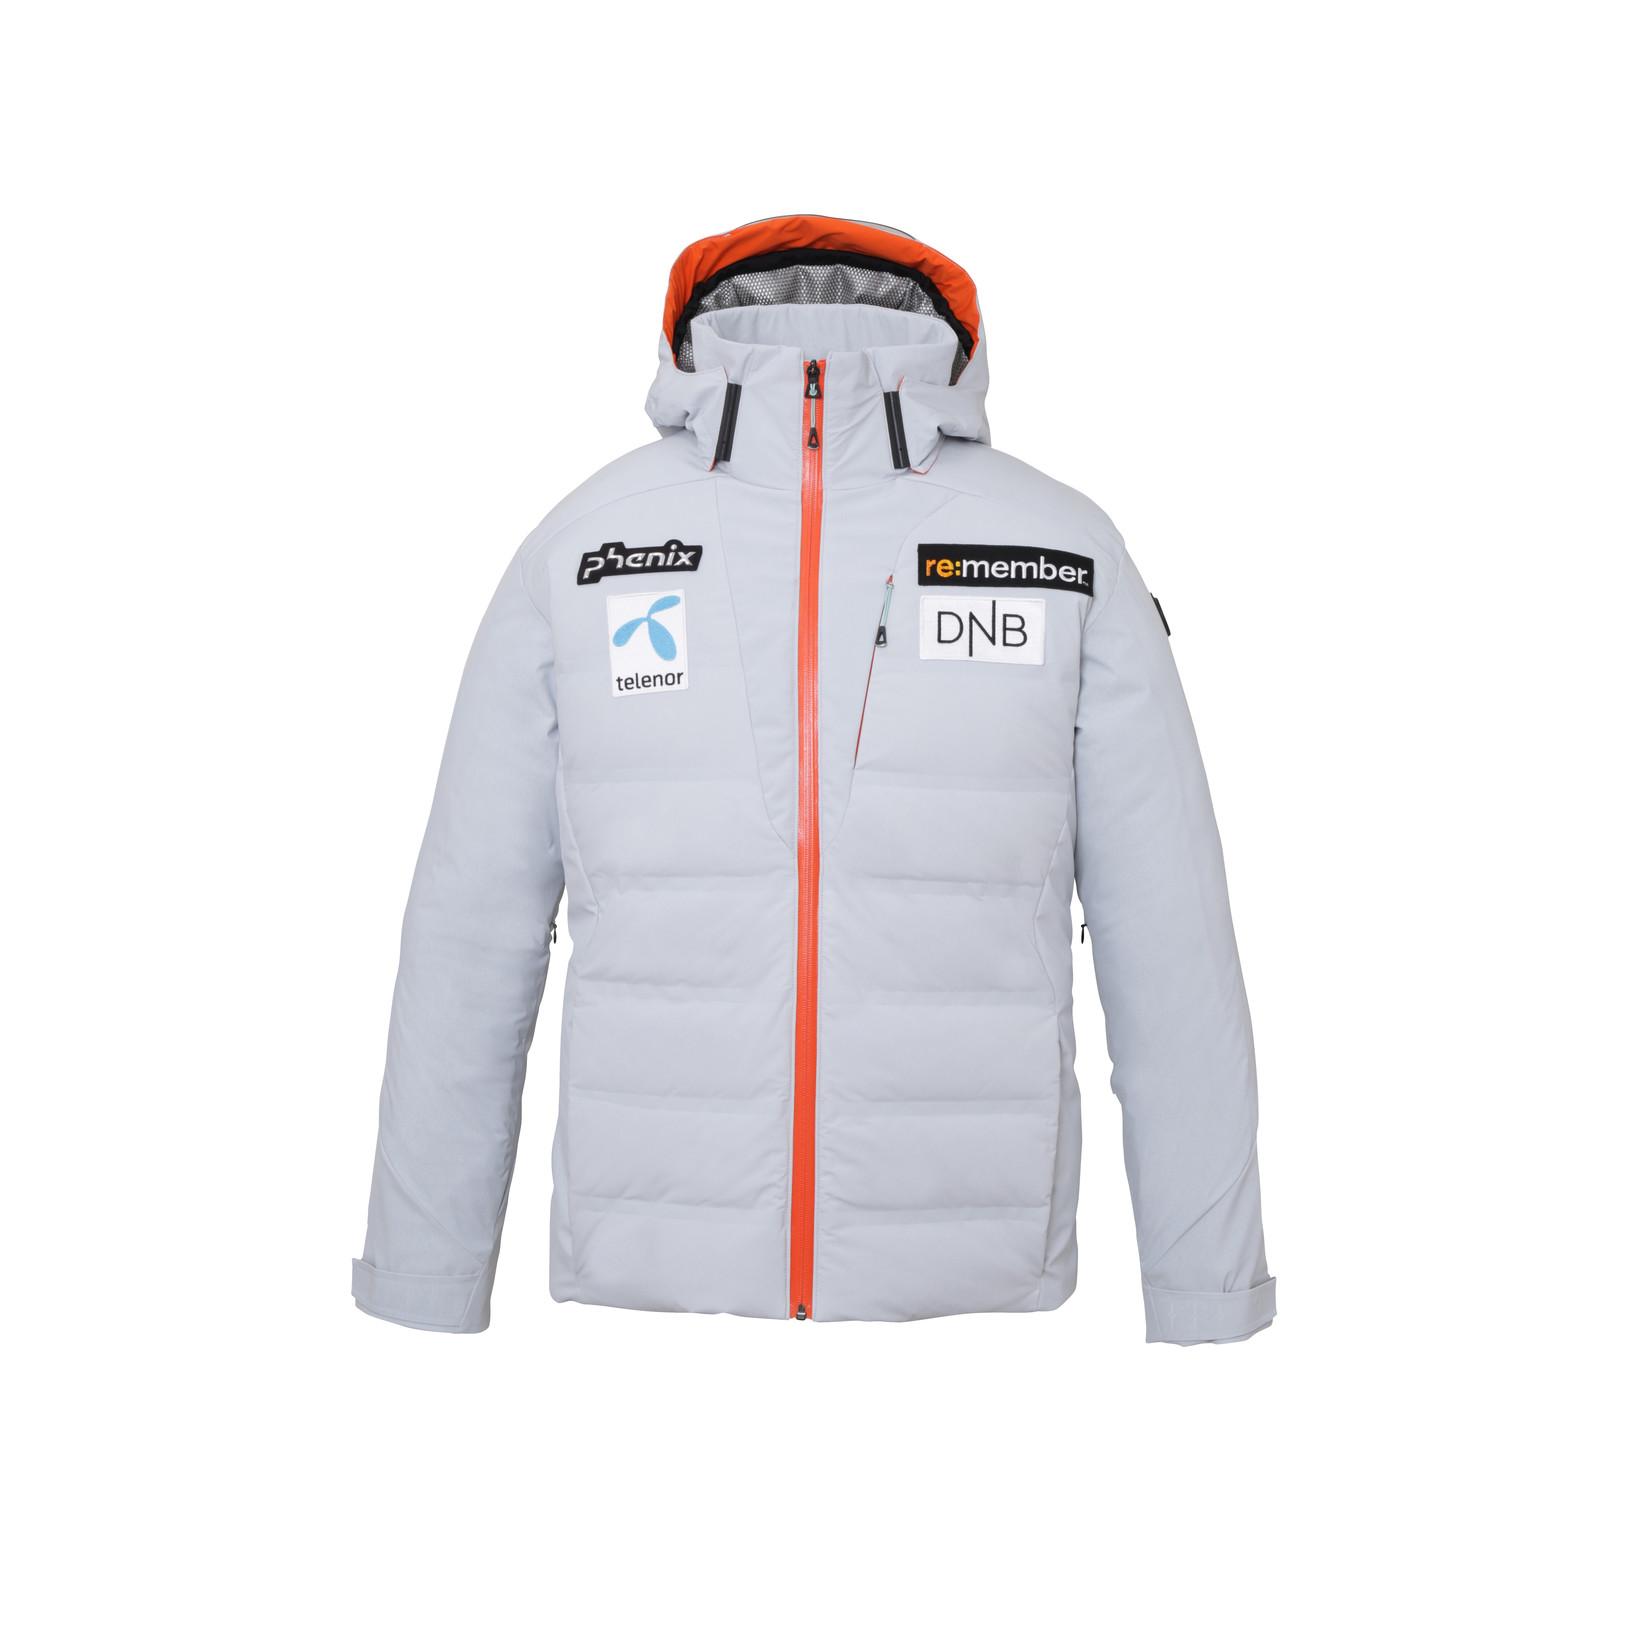 PHENIX Norway Alpine Team Hybrid Down Jacket